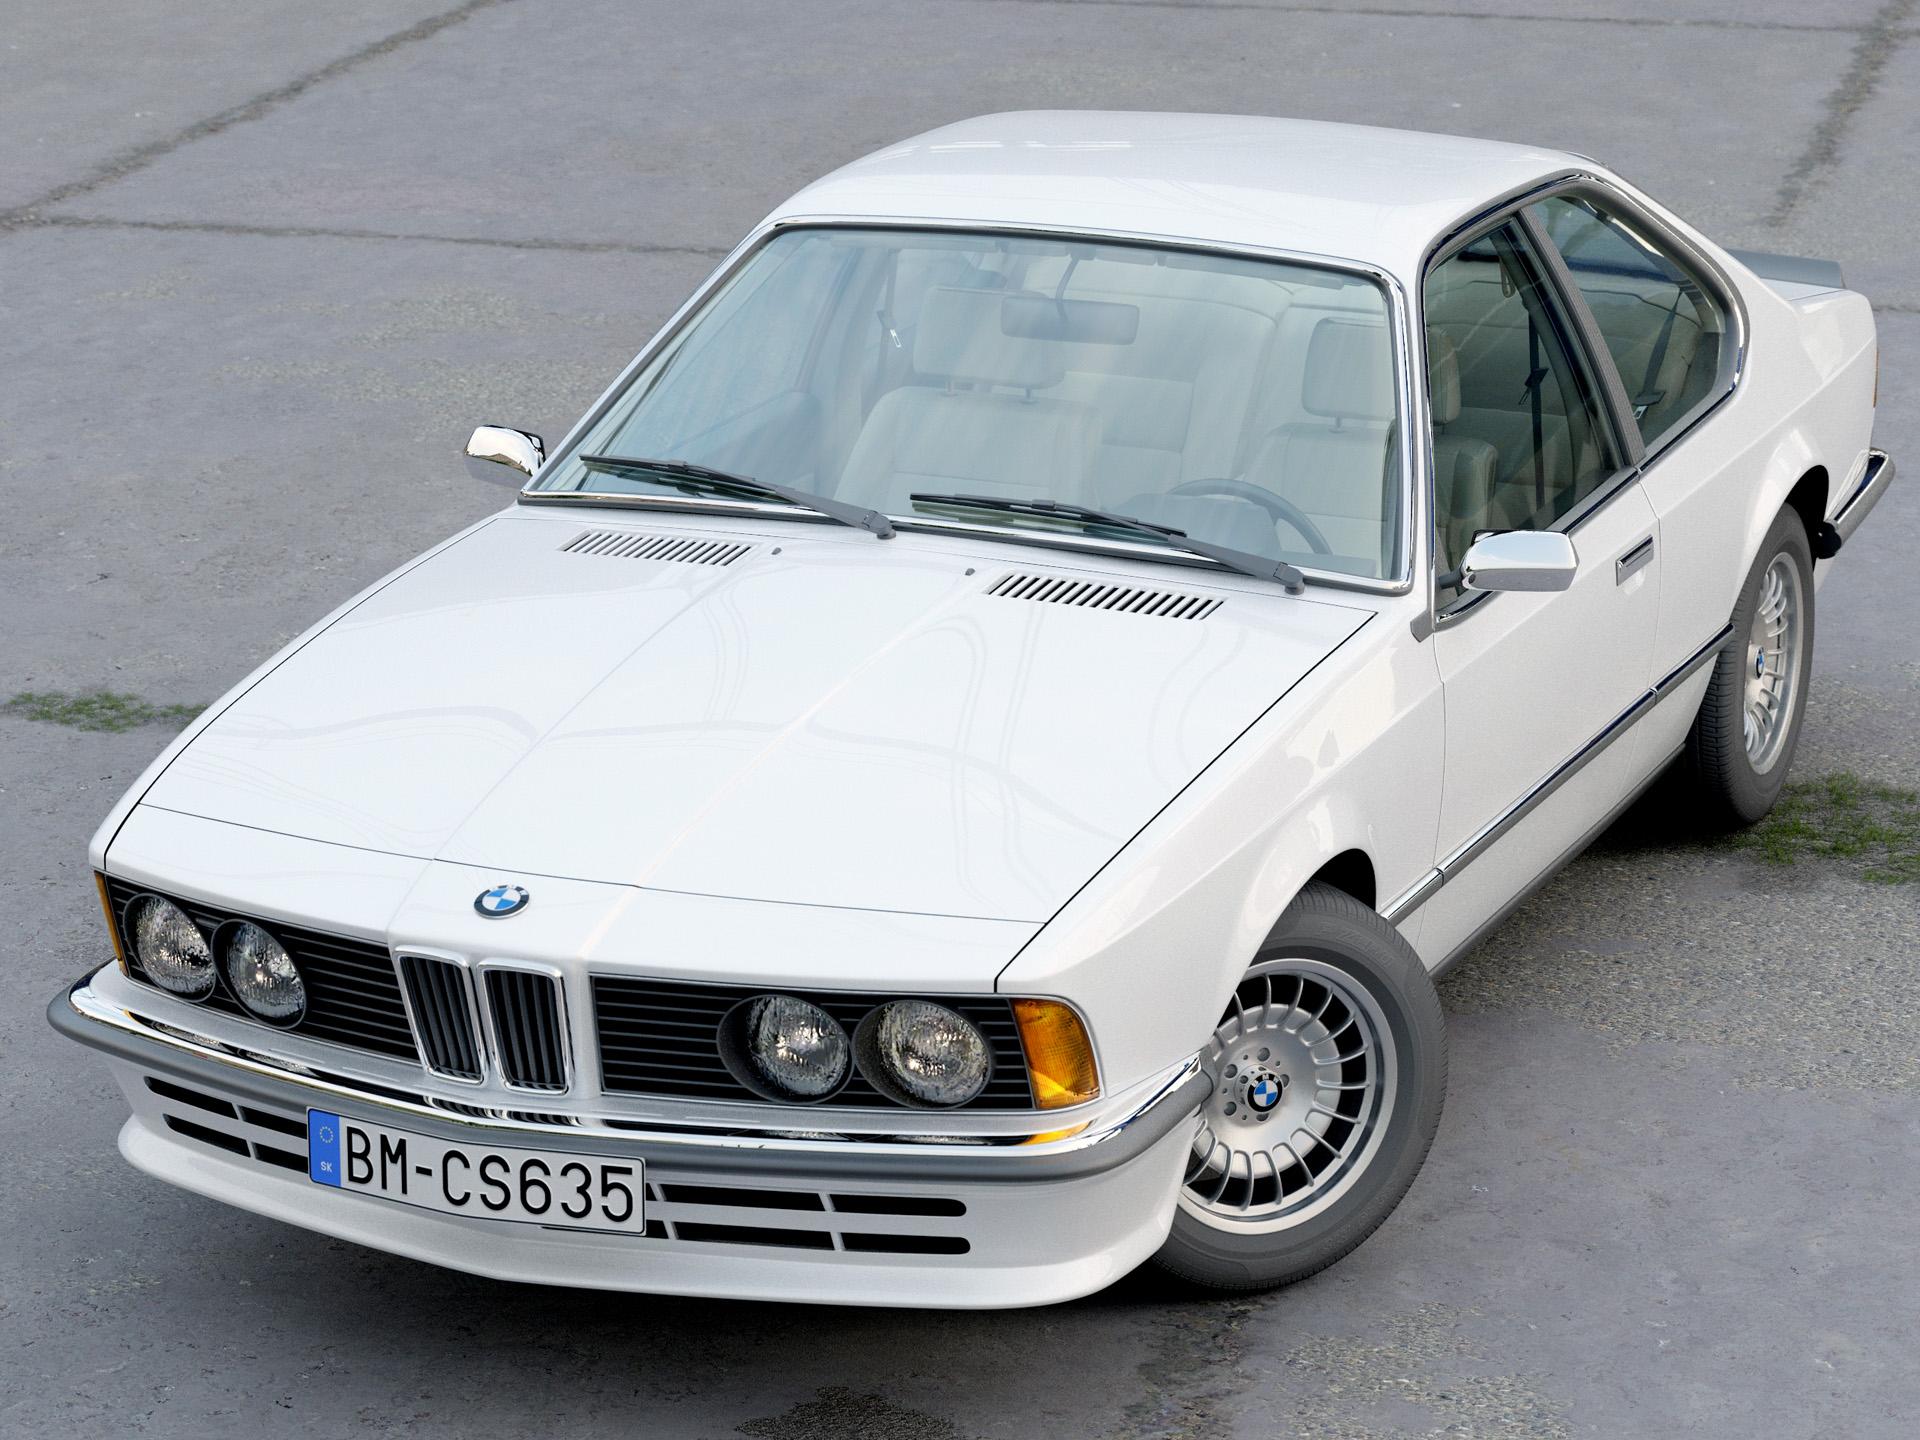 BMW 6 series E24 1986 3d model 3ds max fbx c4d obj 271318